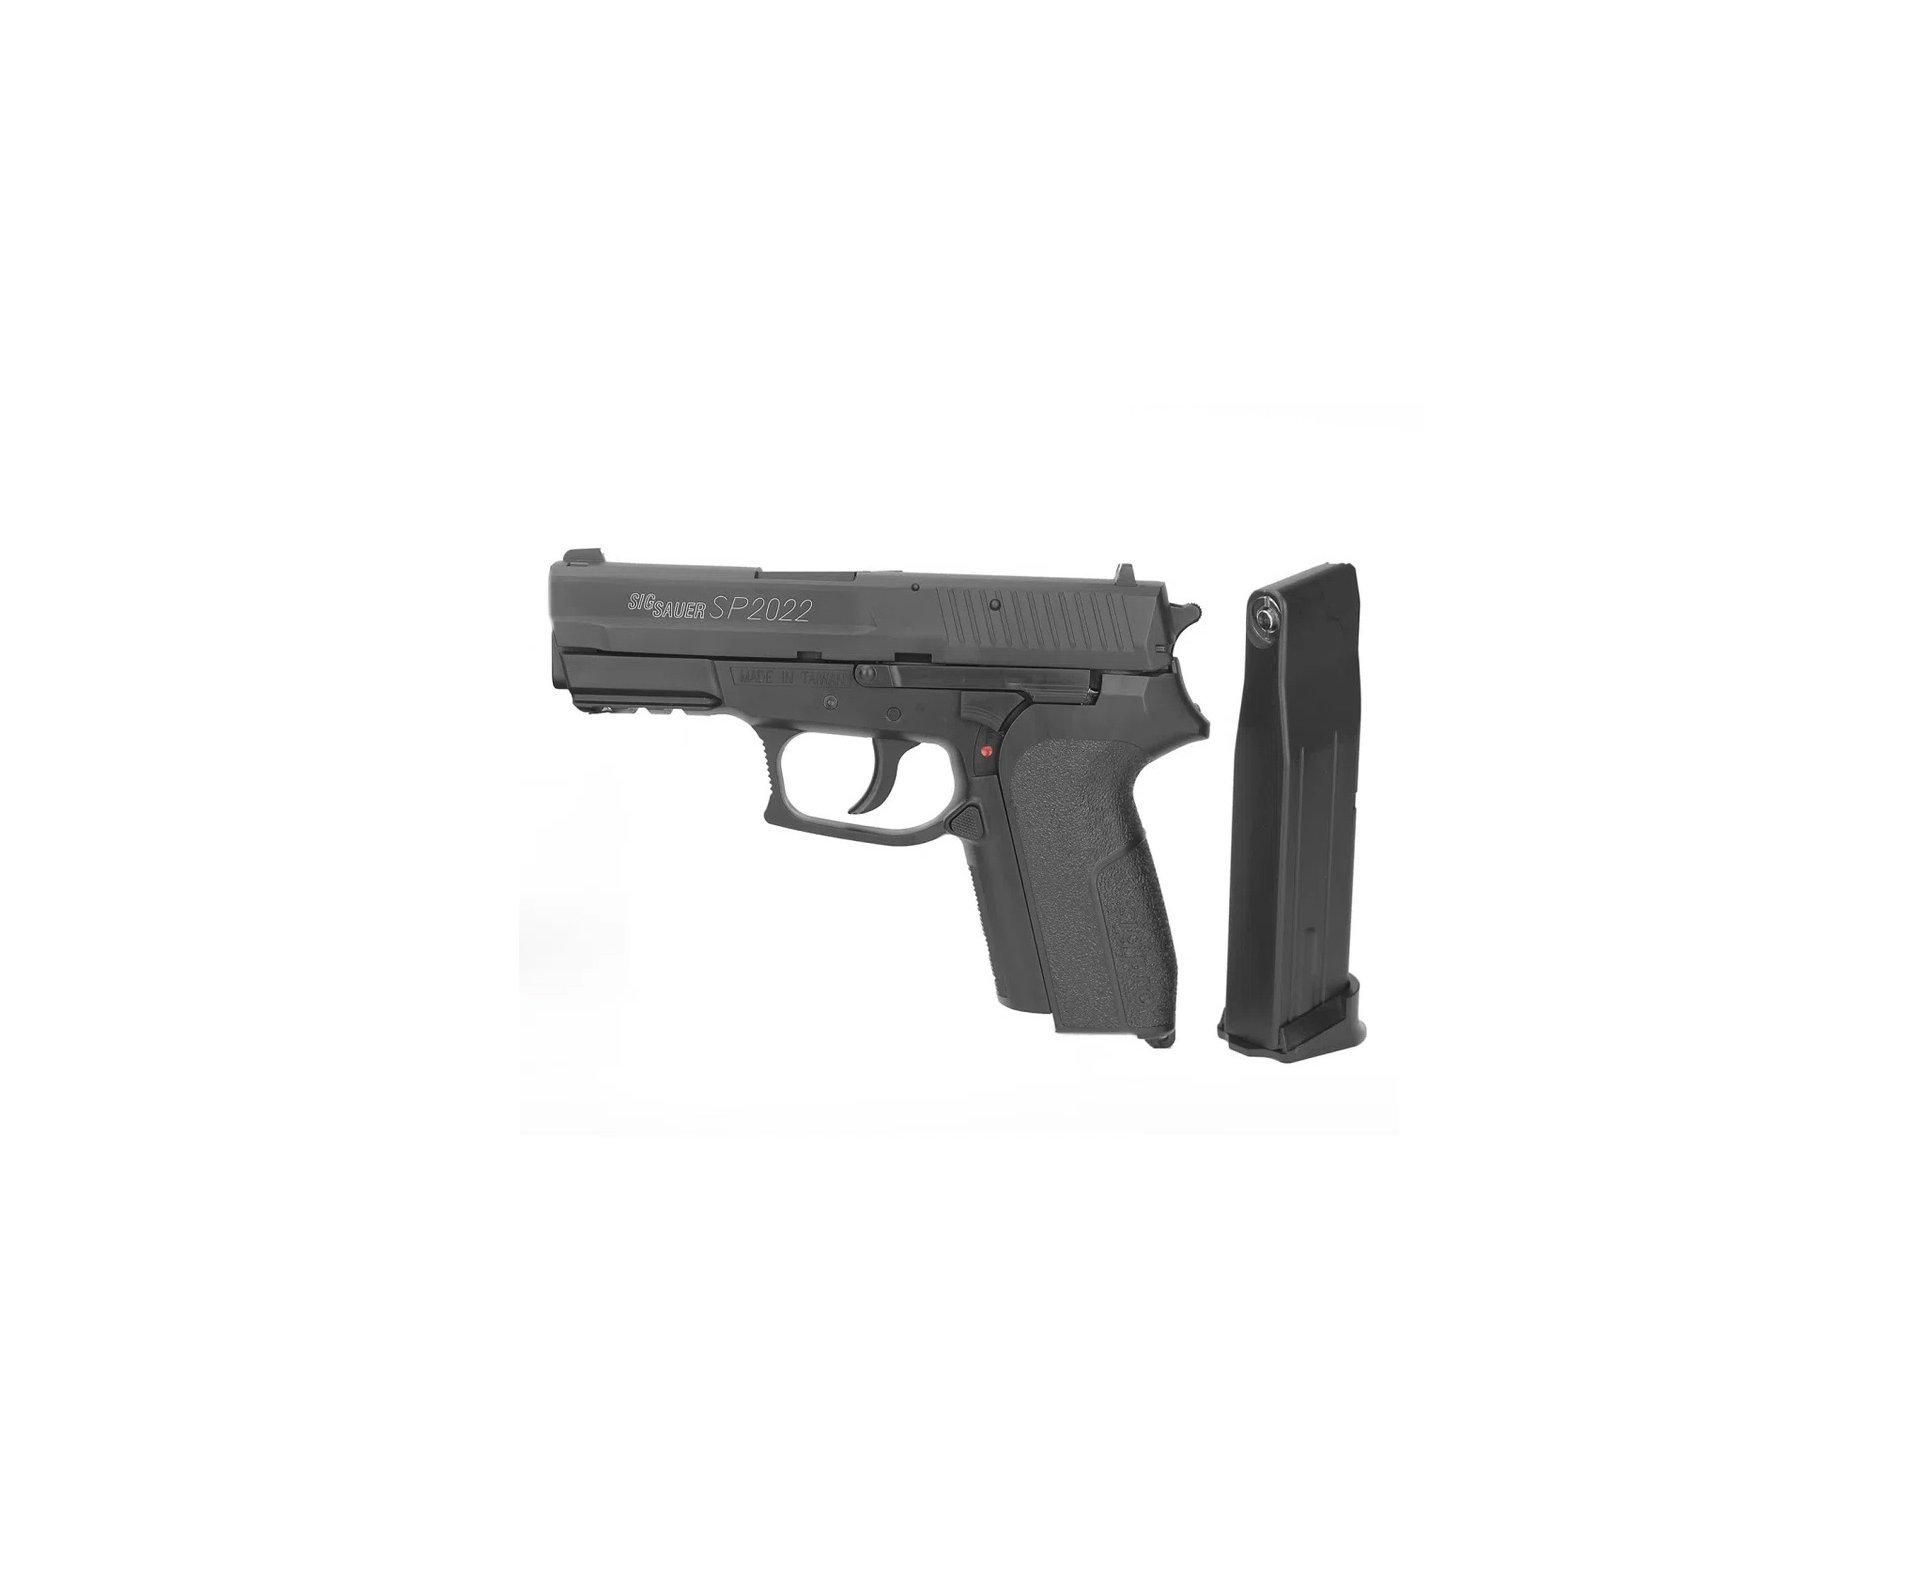 Pistola de Pressão Gas Co2 Sig Sauer SP2022 Cal 4,5mm Cybergun